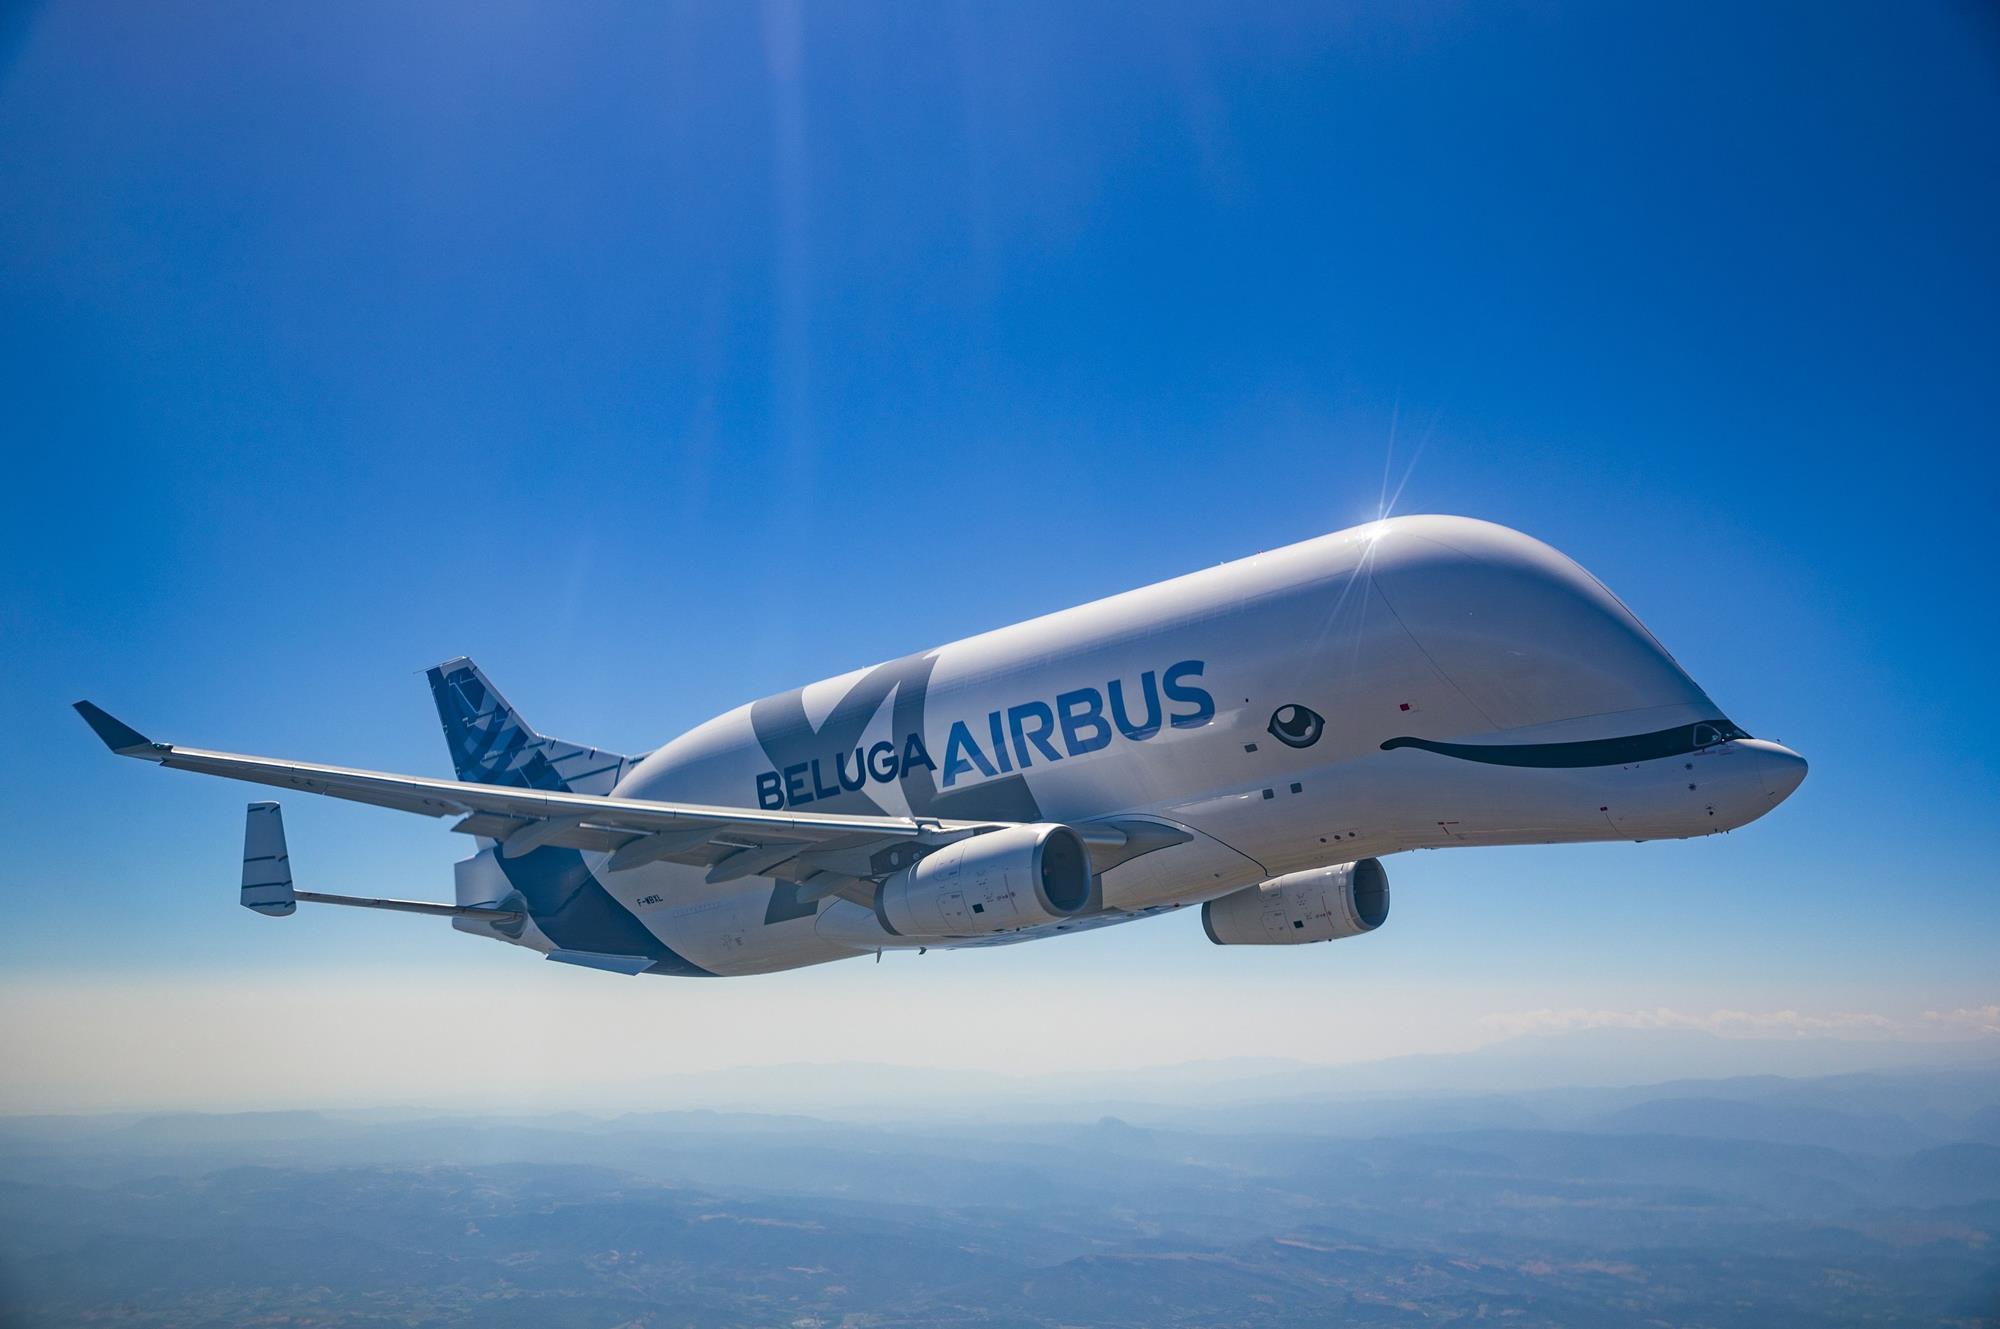 Airbus begins BelugaXL operations